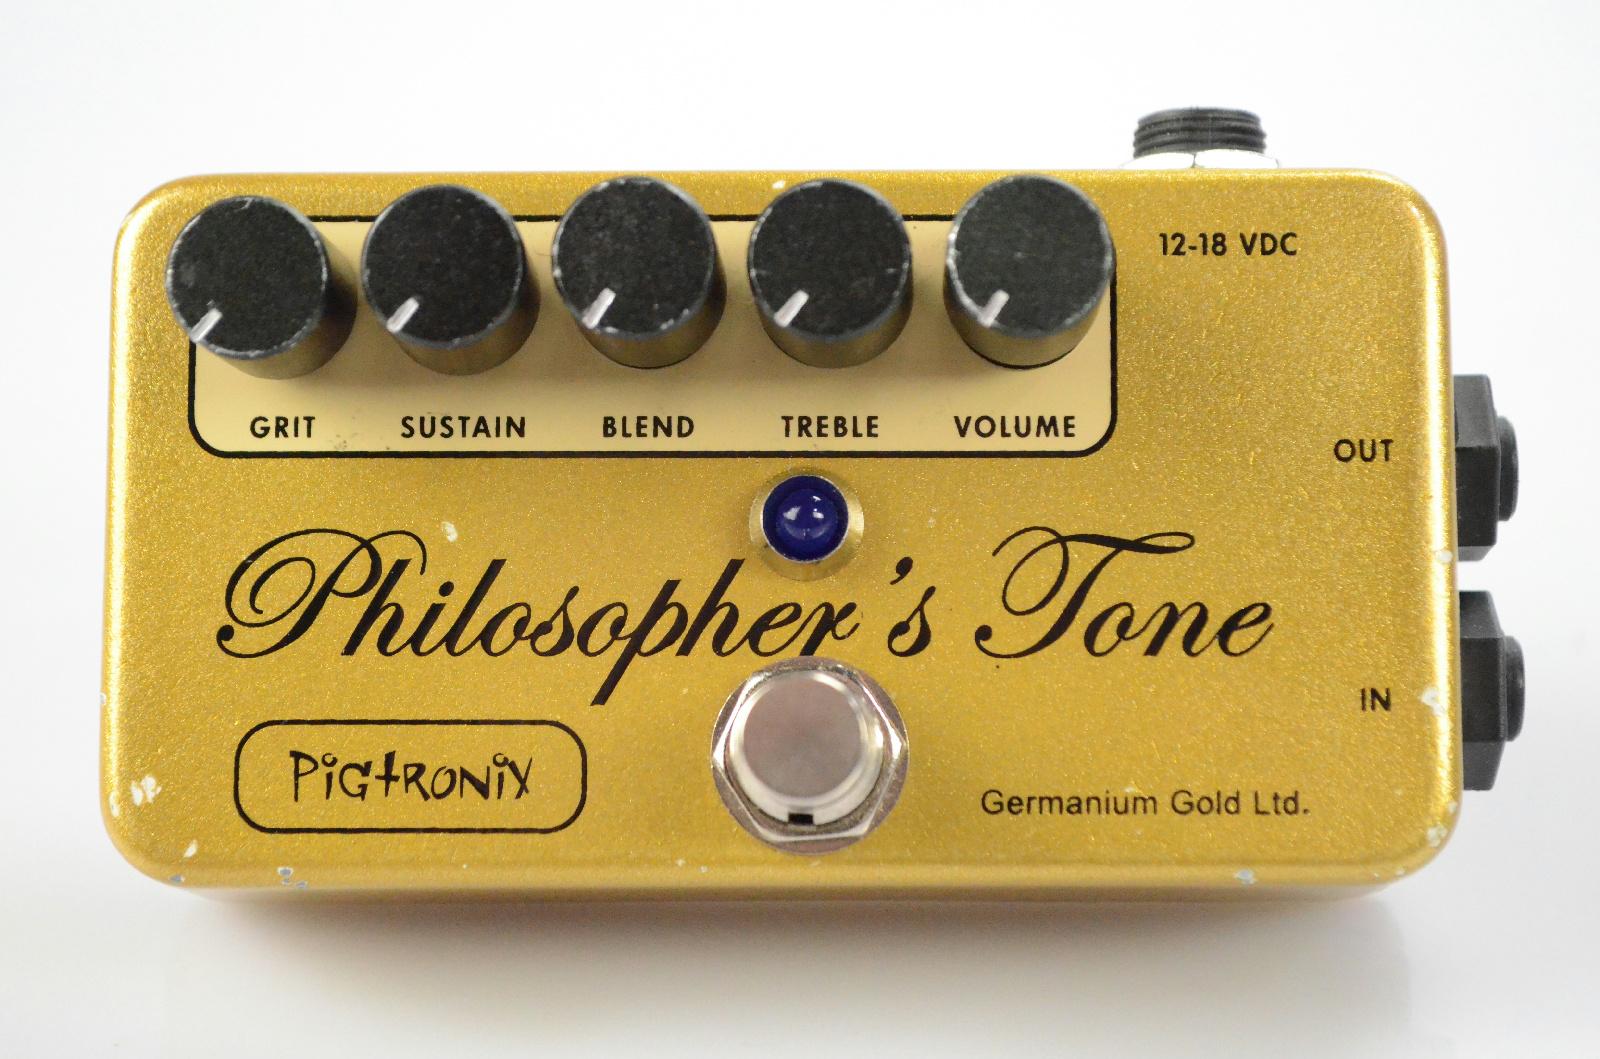 Pigtronix Philosopher's Tone Germanium Gold Ltd. Limited Edition Myrold #33097